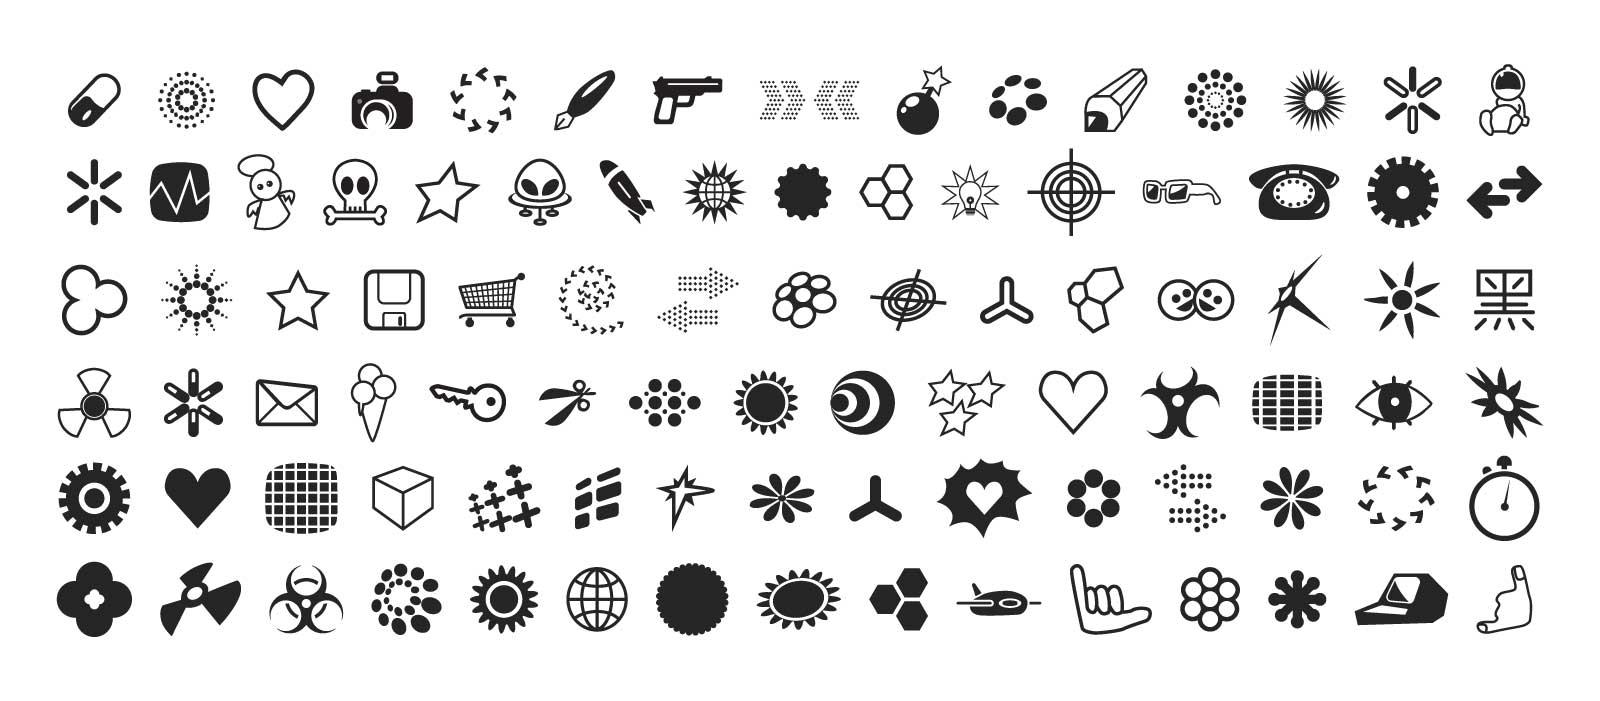 Elemento de moda vetorial de gráficos bonitos